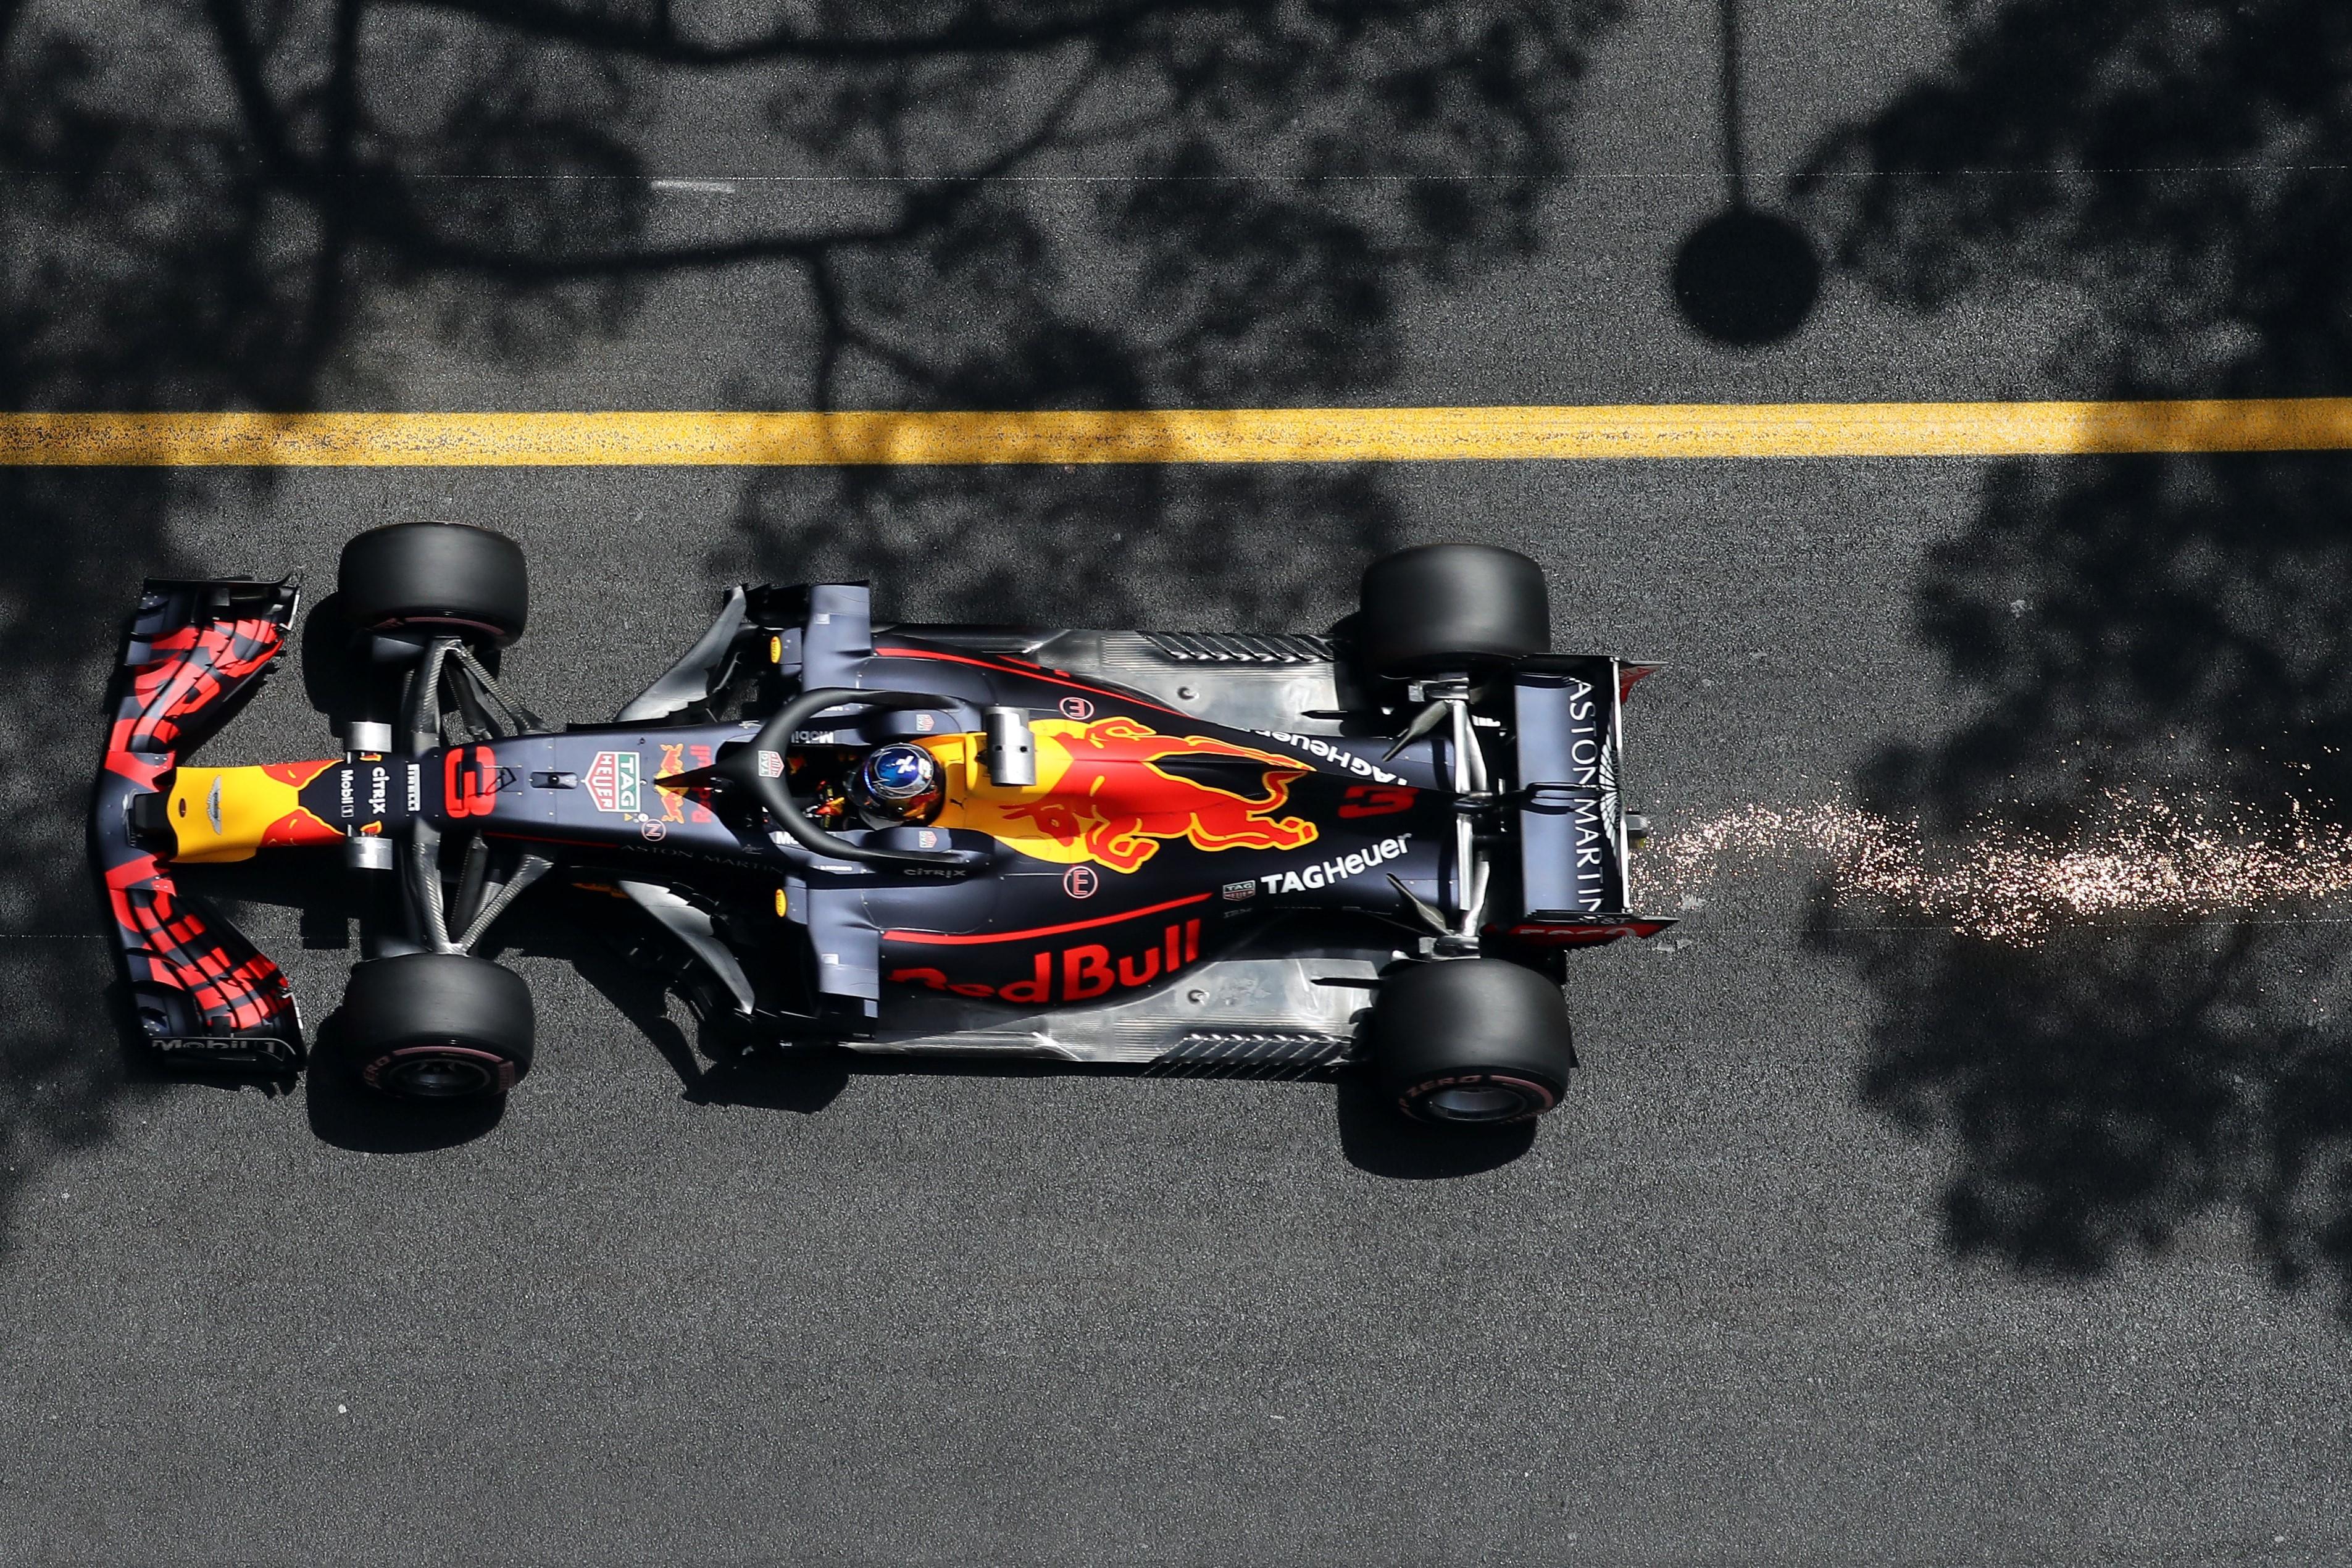 Daniel Ricciardo (Red Bull) au Grand Prix de Monaco 2018